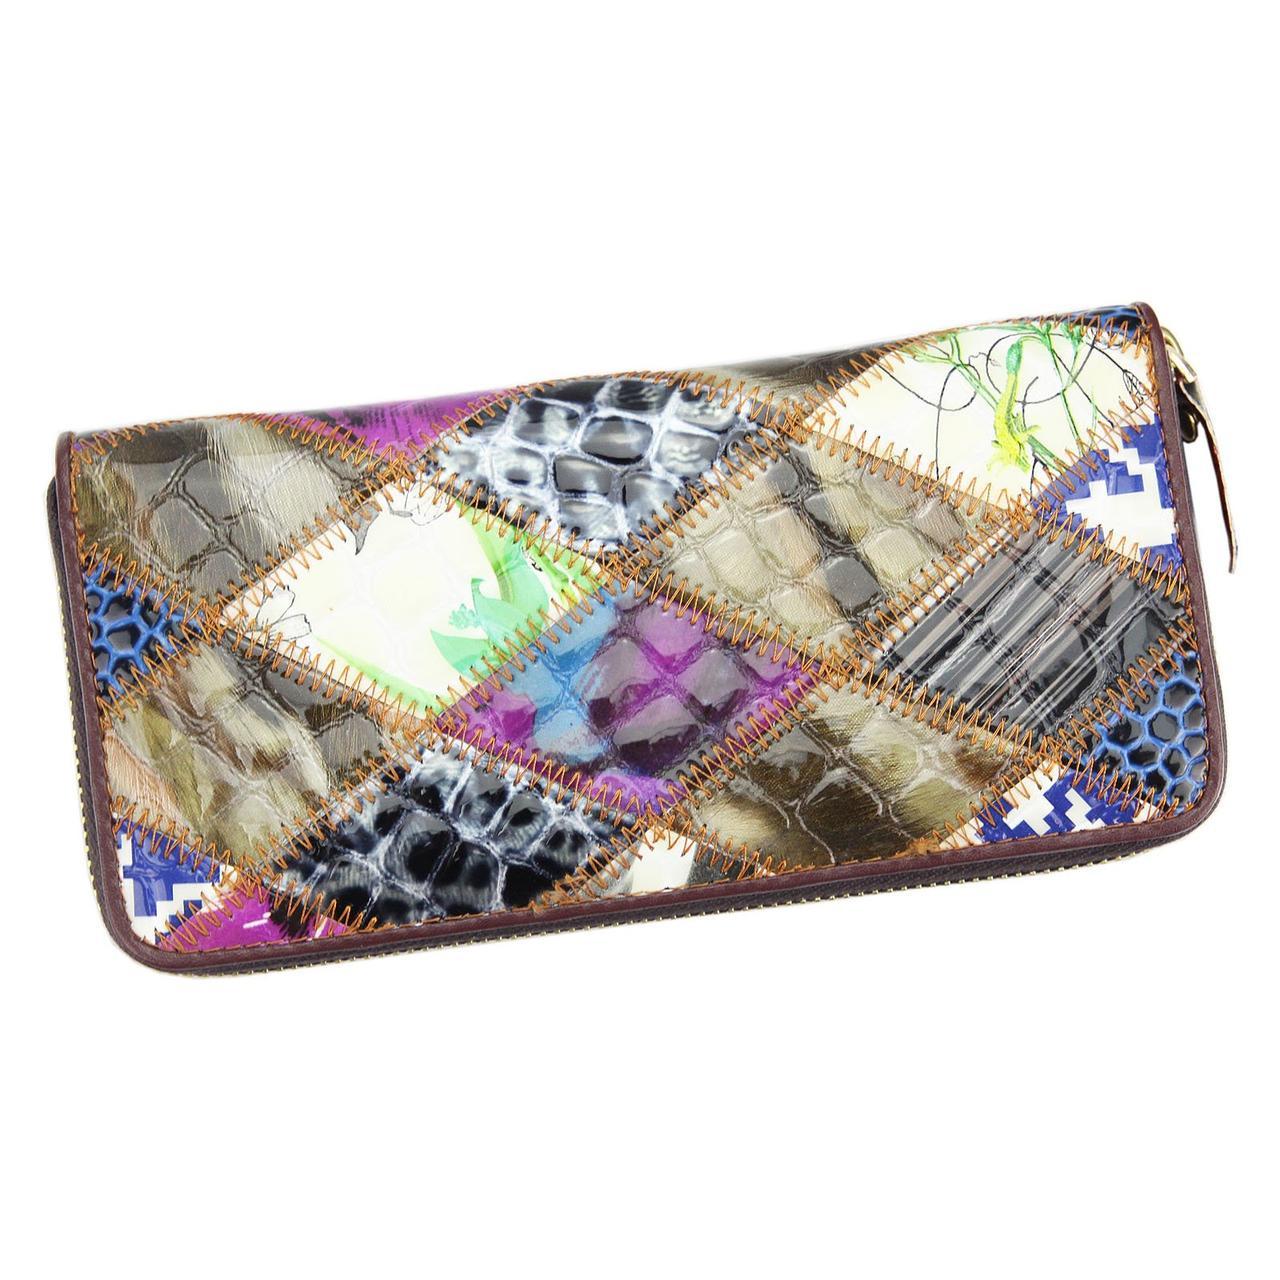 Женский кожаный кошелек Giorgio PVV 9008 Цветной